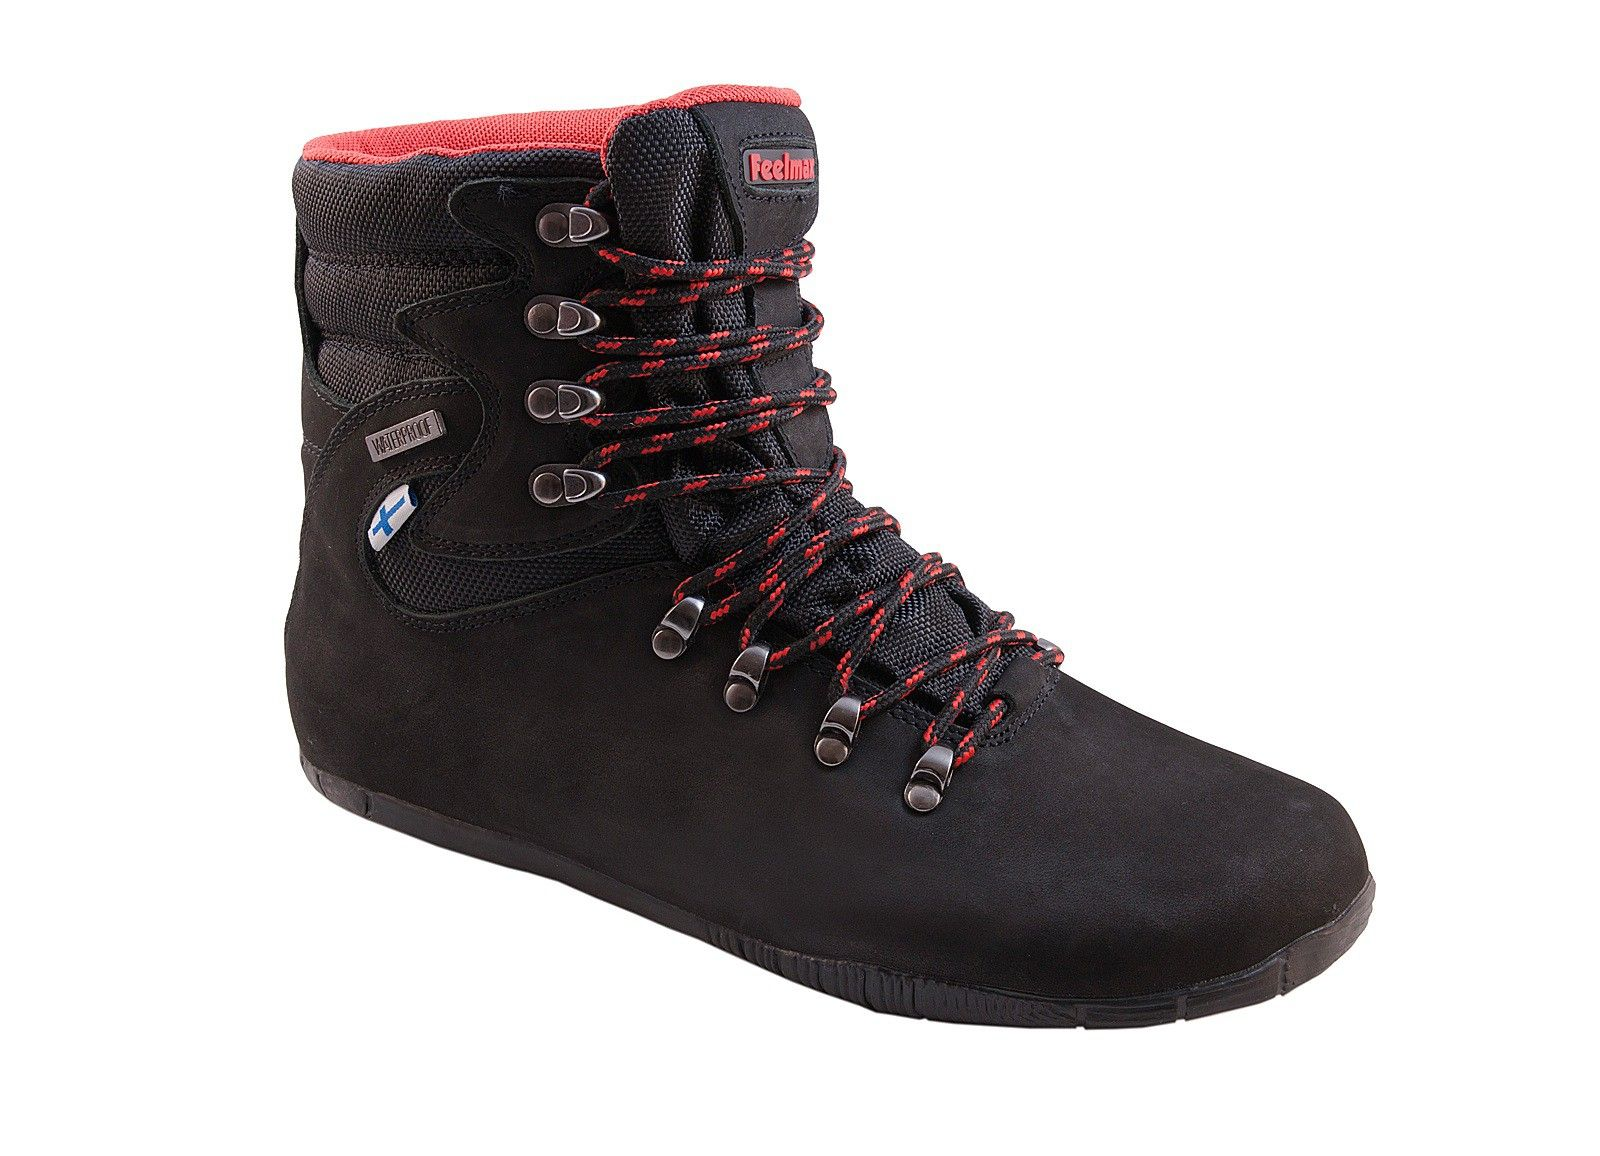 Feelmax Kuuva 3 Waterproof Barefoot Shoe 290 Grams Per